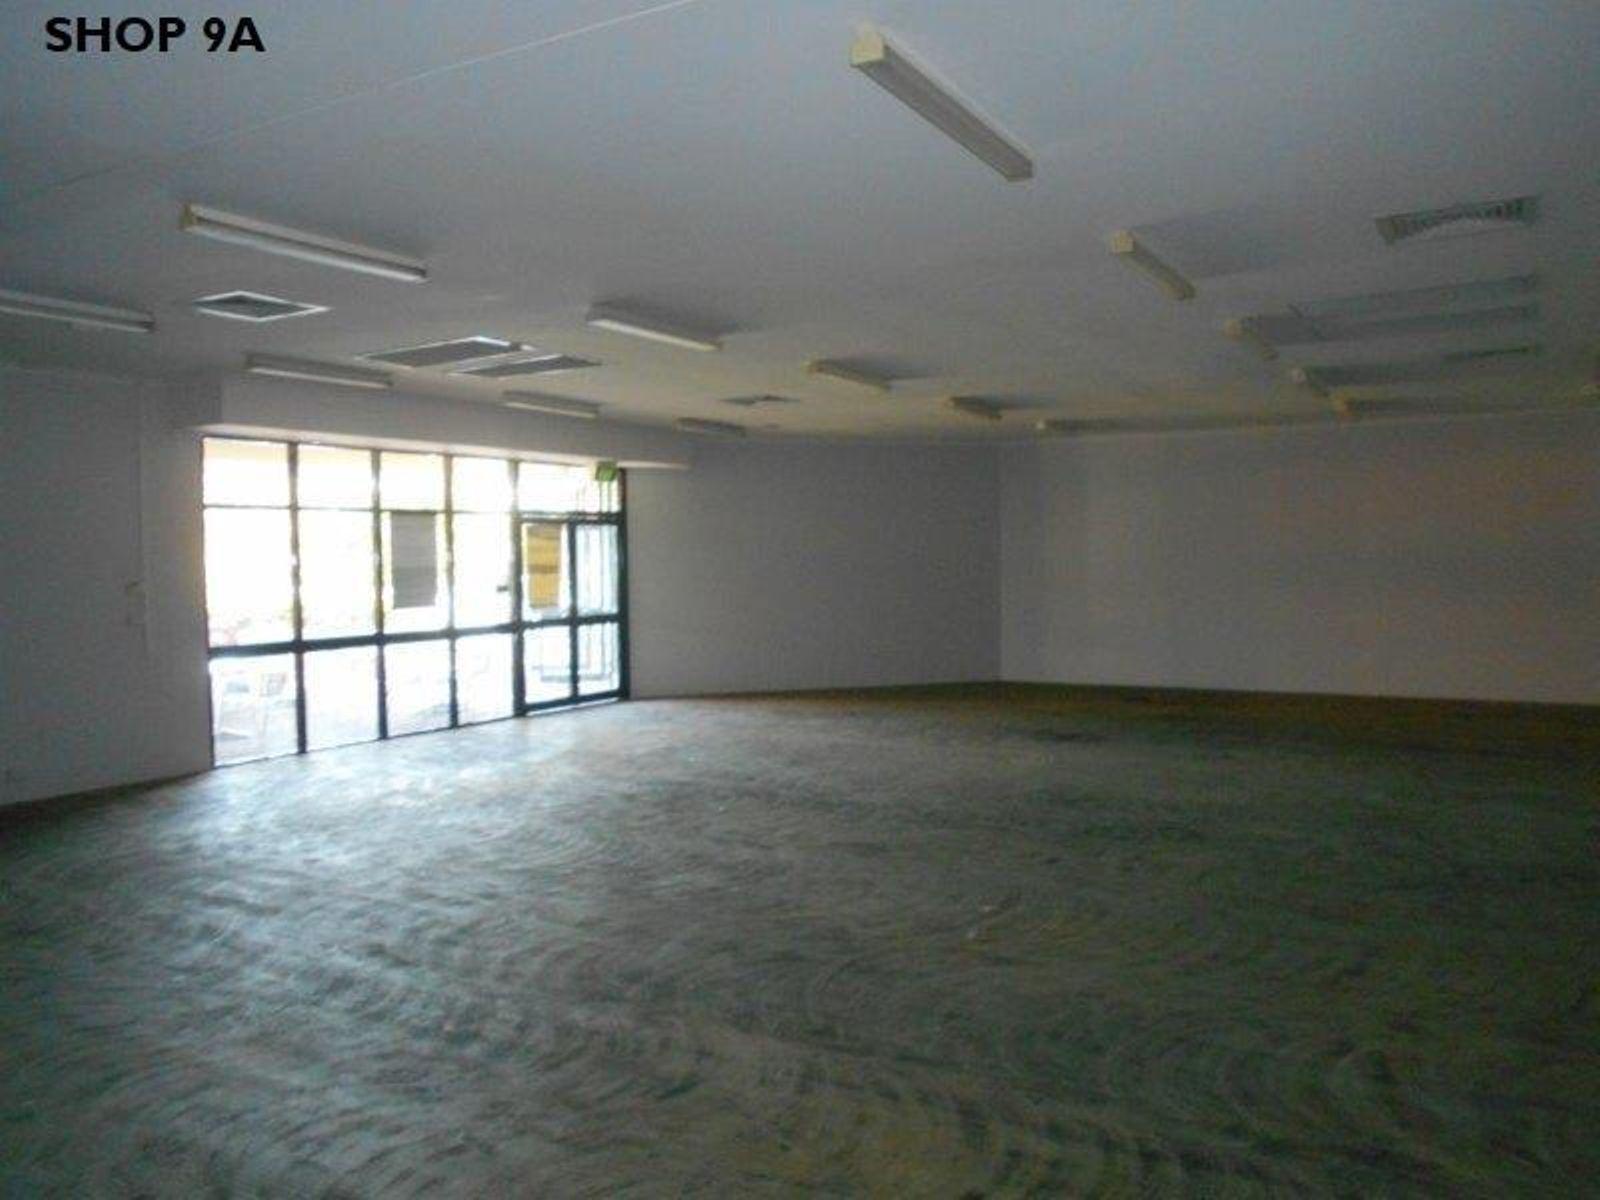 9A/4-6 Grandview Drive, Mount Pleasant, QLD 4740